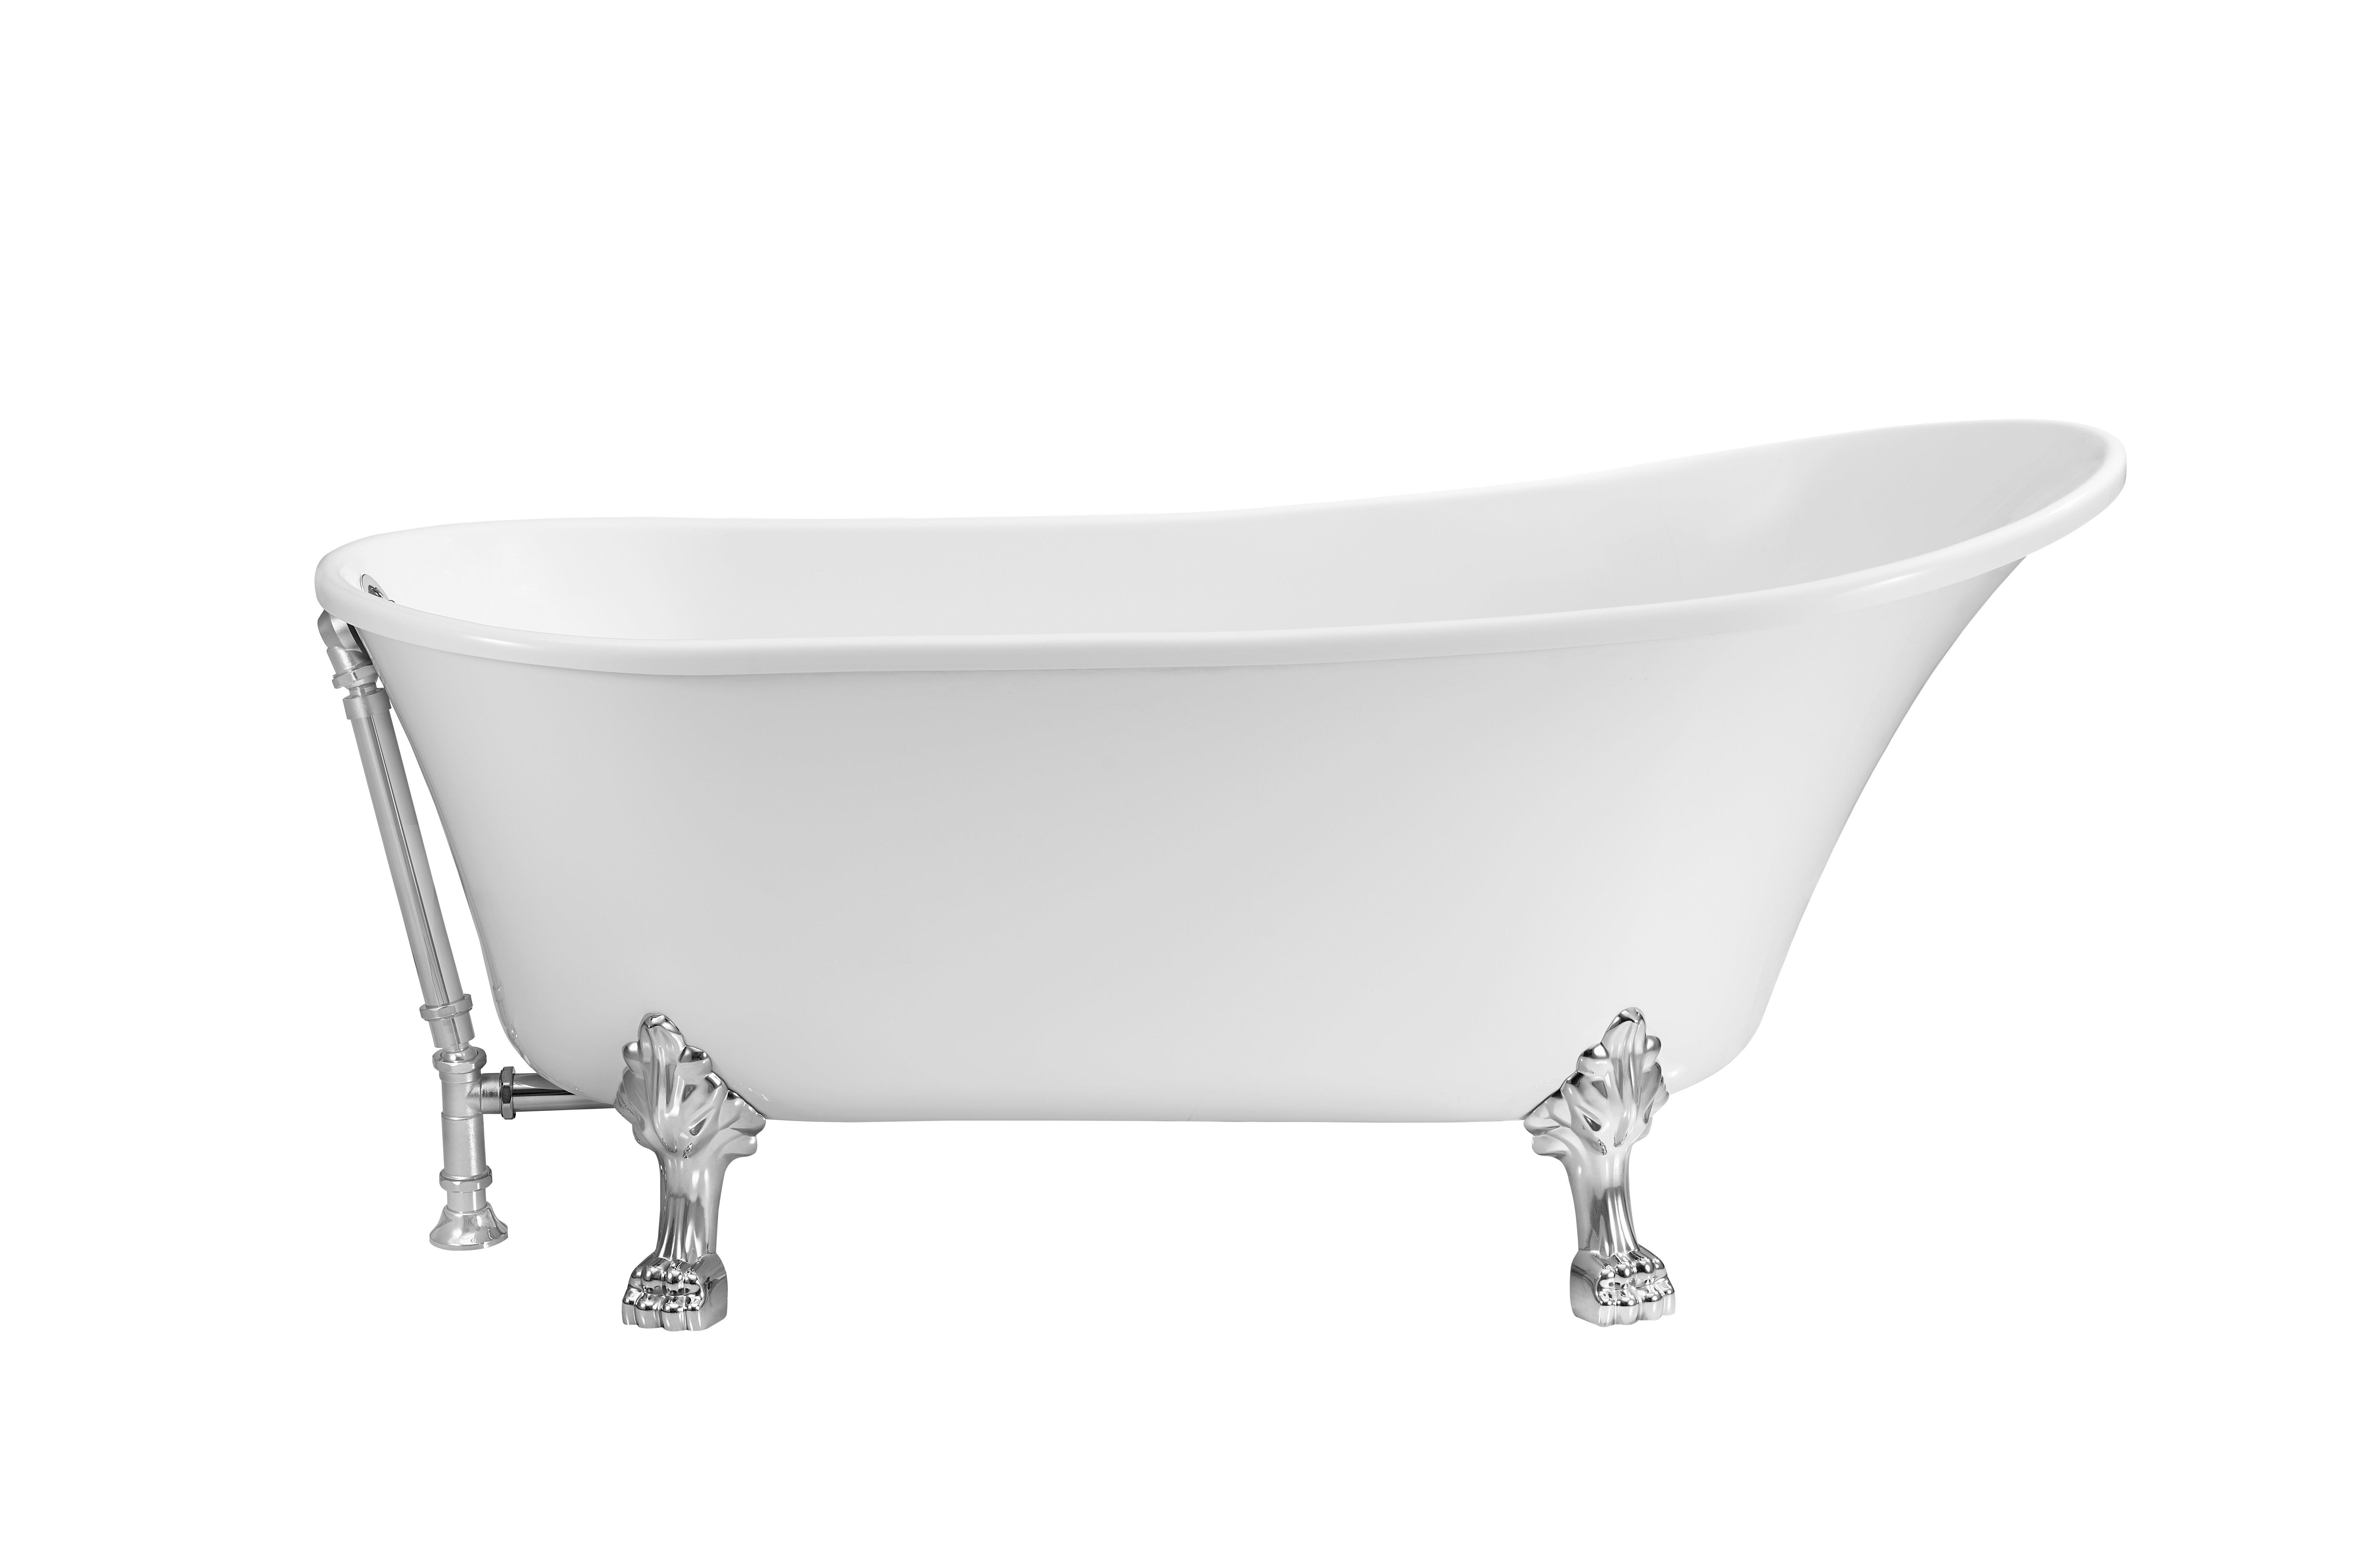 scarlett bathtubs bathtub castellousa x home freestanding soaking wyndham reviews pdx wayfair improvement